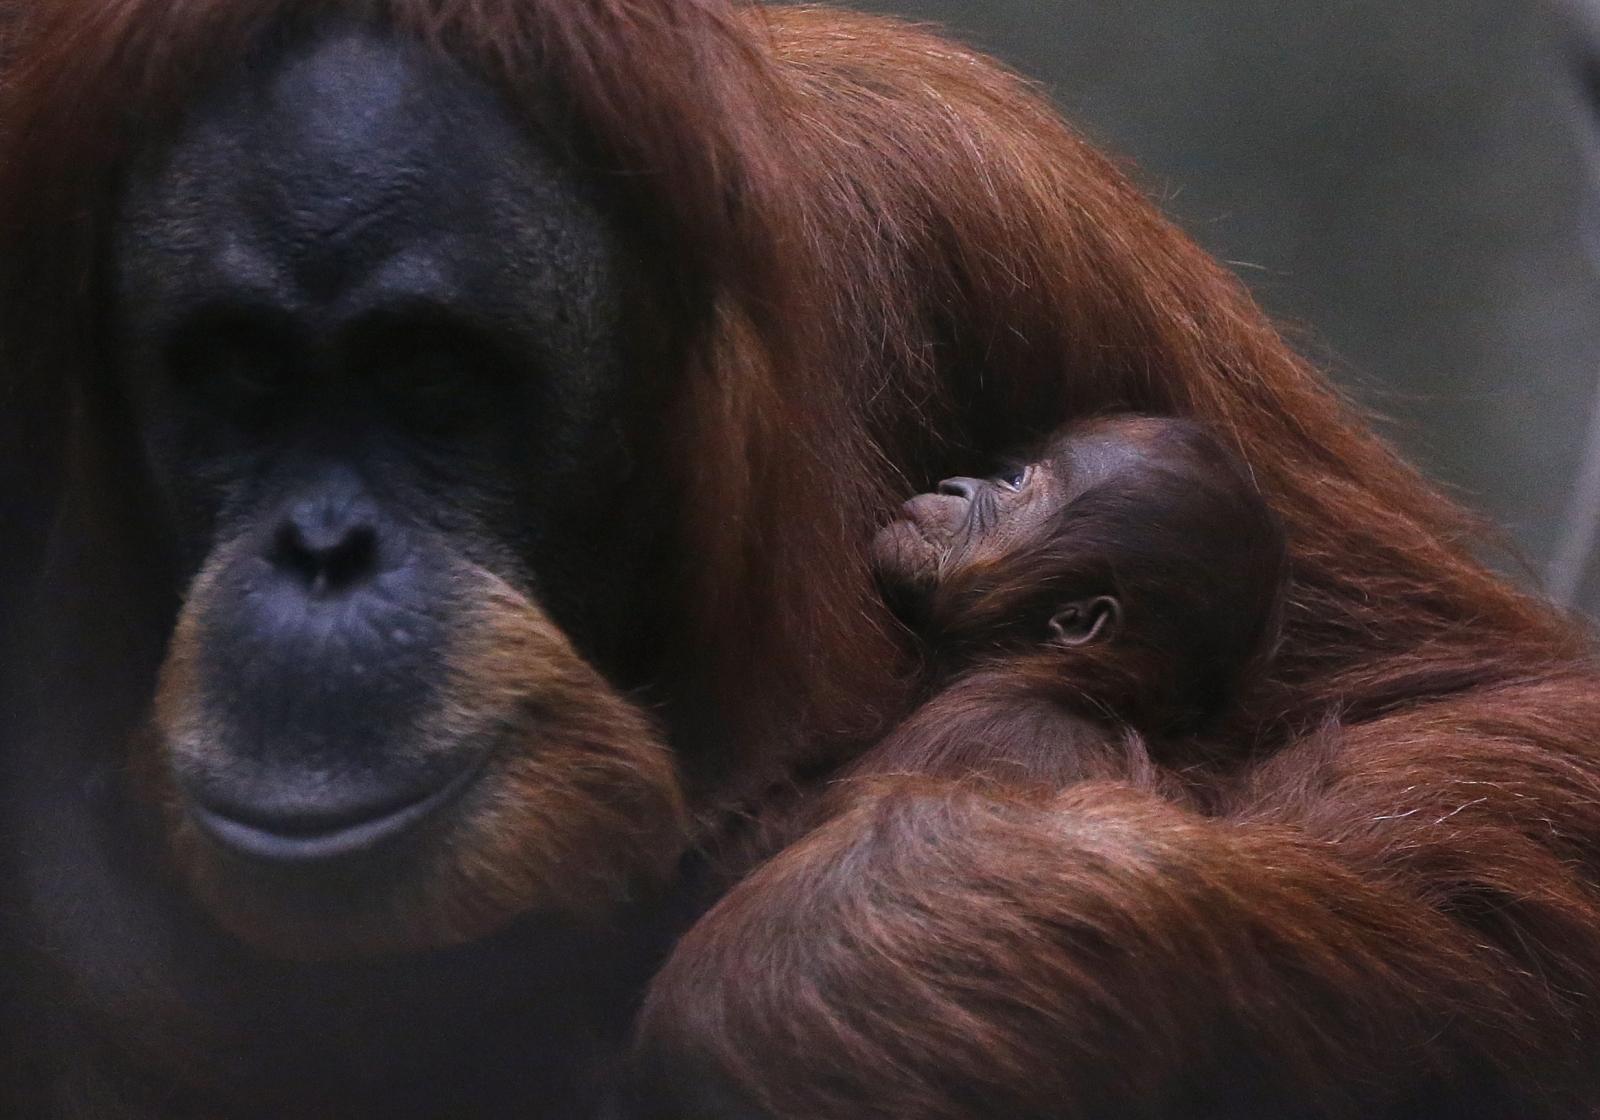 Sumatran orangutan Argentina Zoo Freed Habeas Corpus